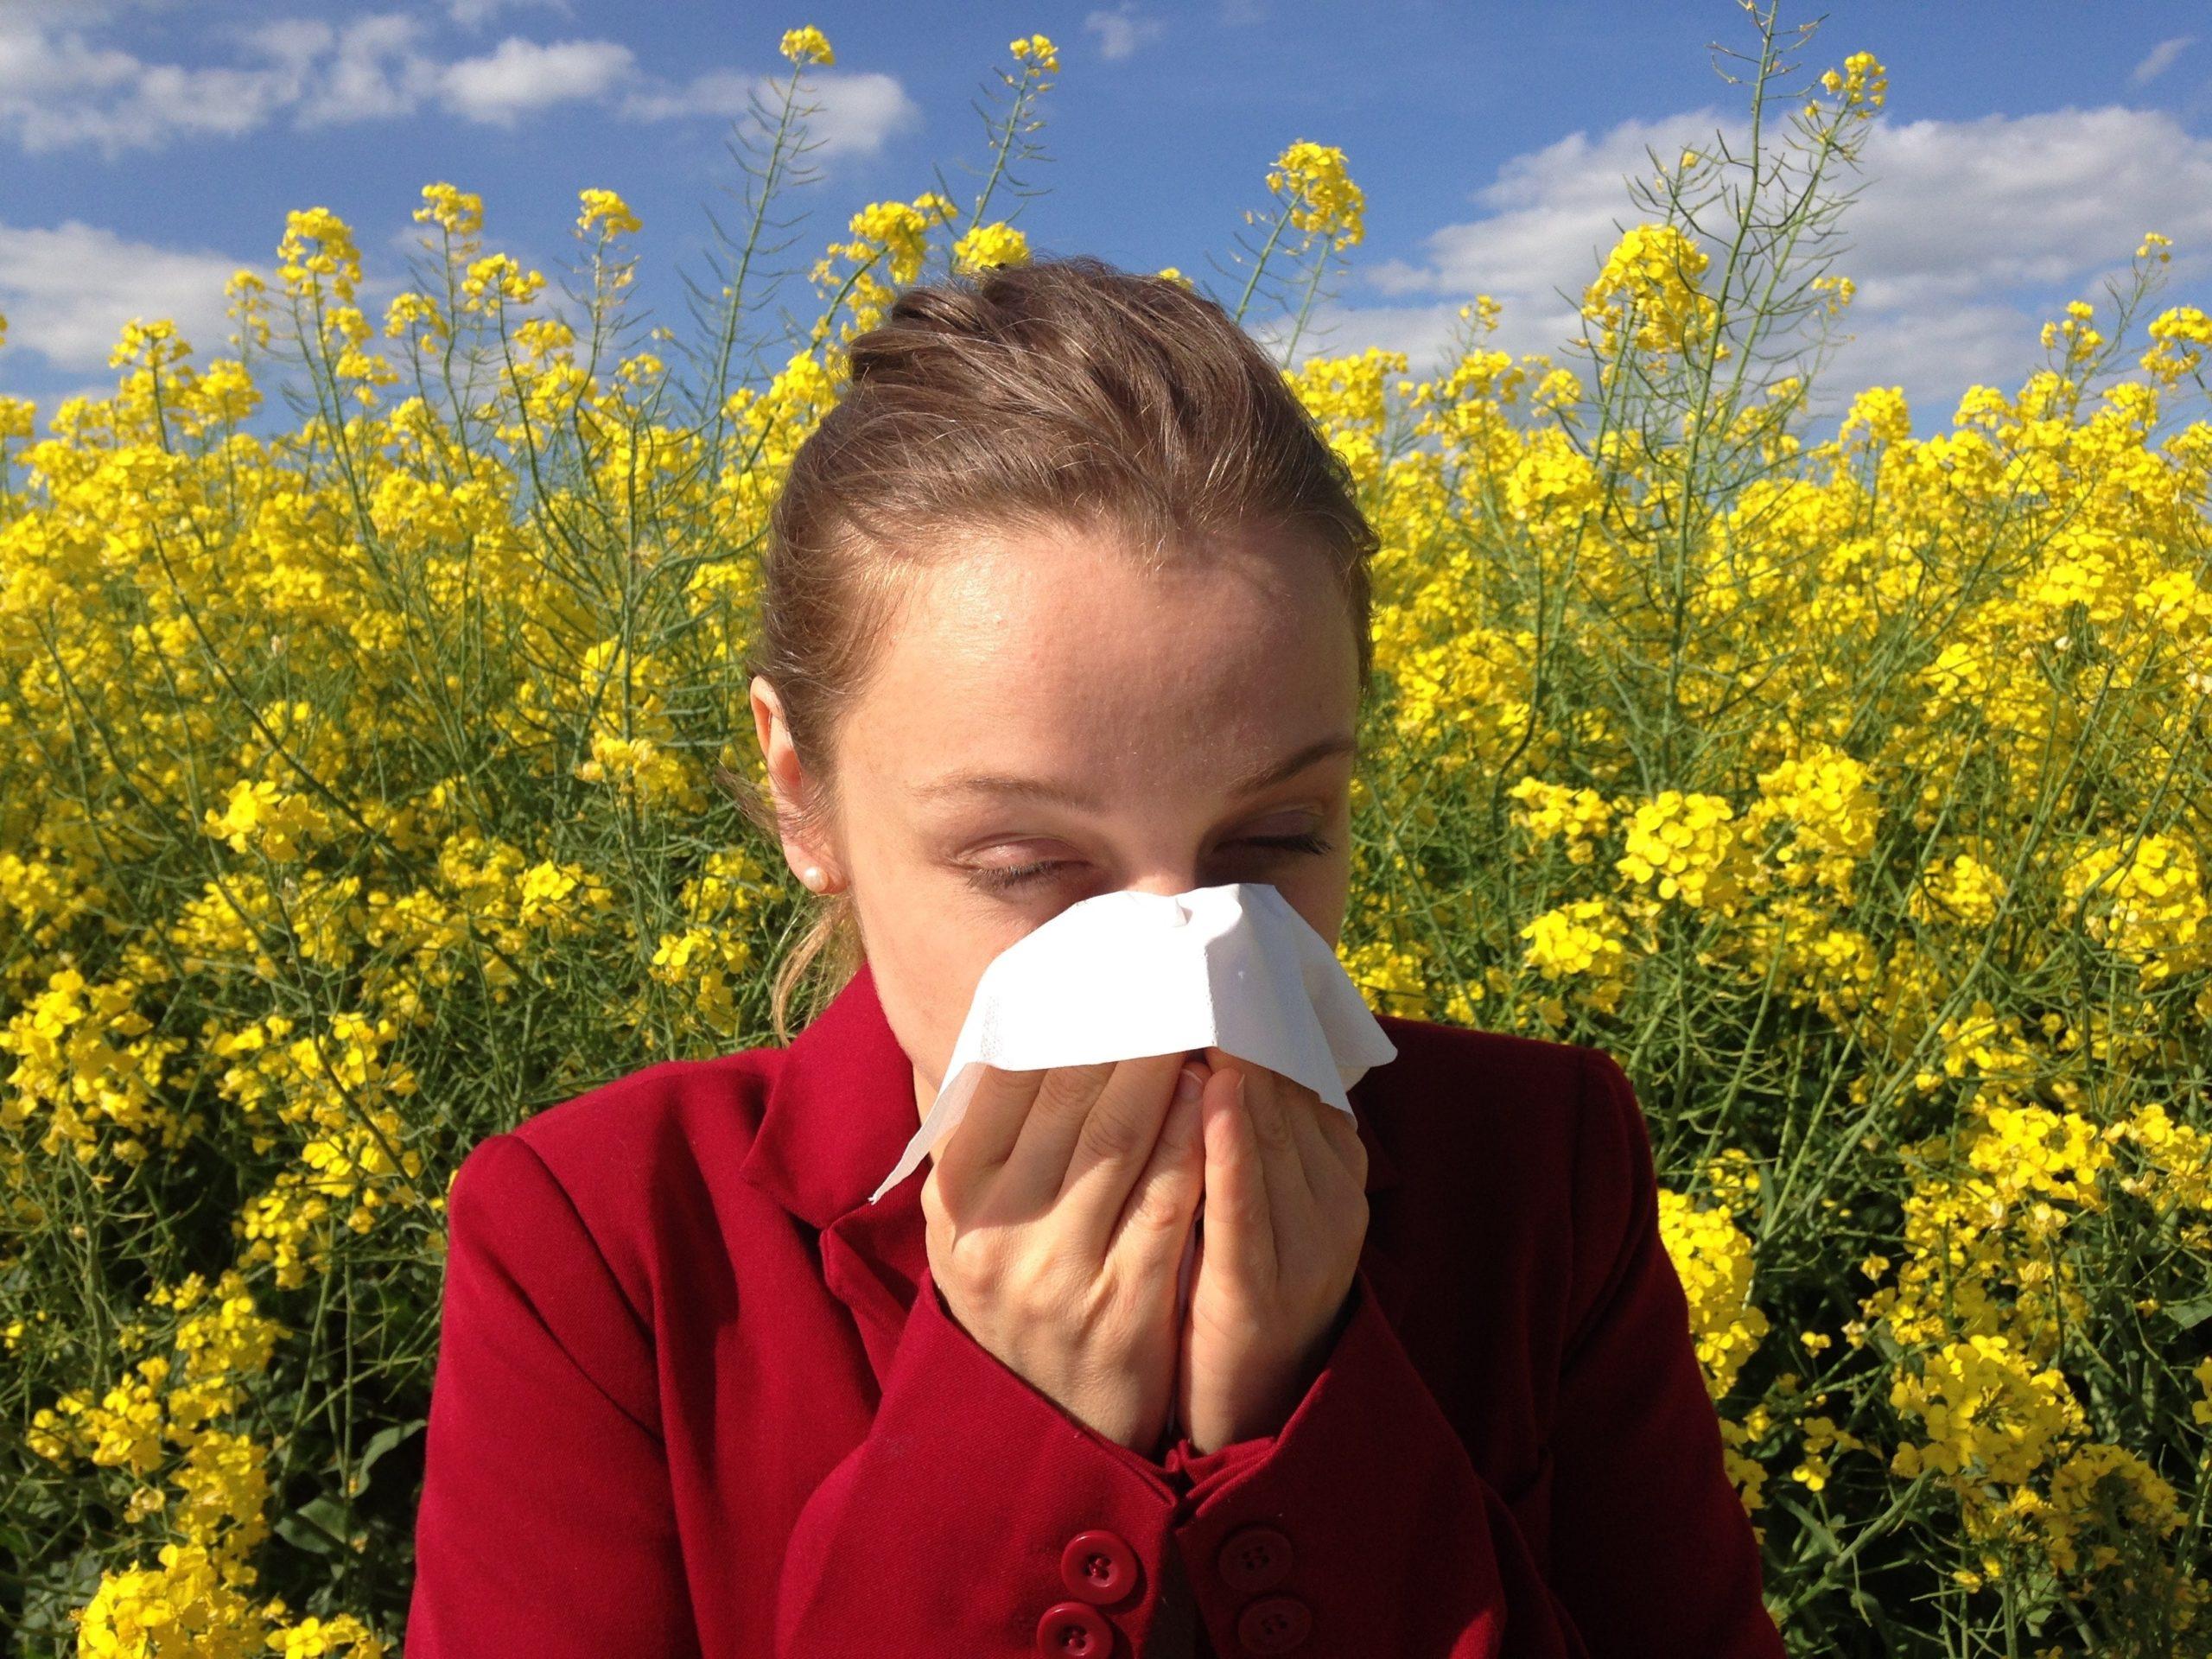 Difference Between Coronavirus vs Flu vs Cold vs Allergies